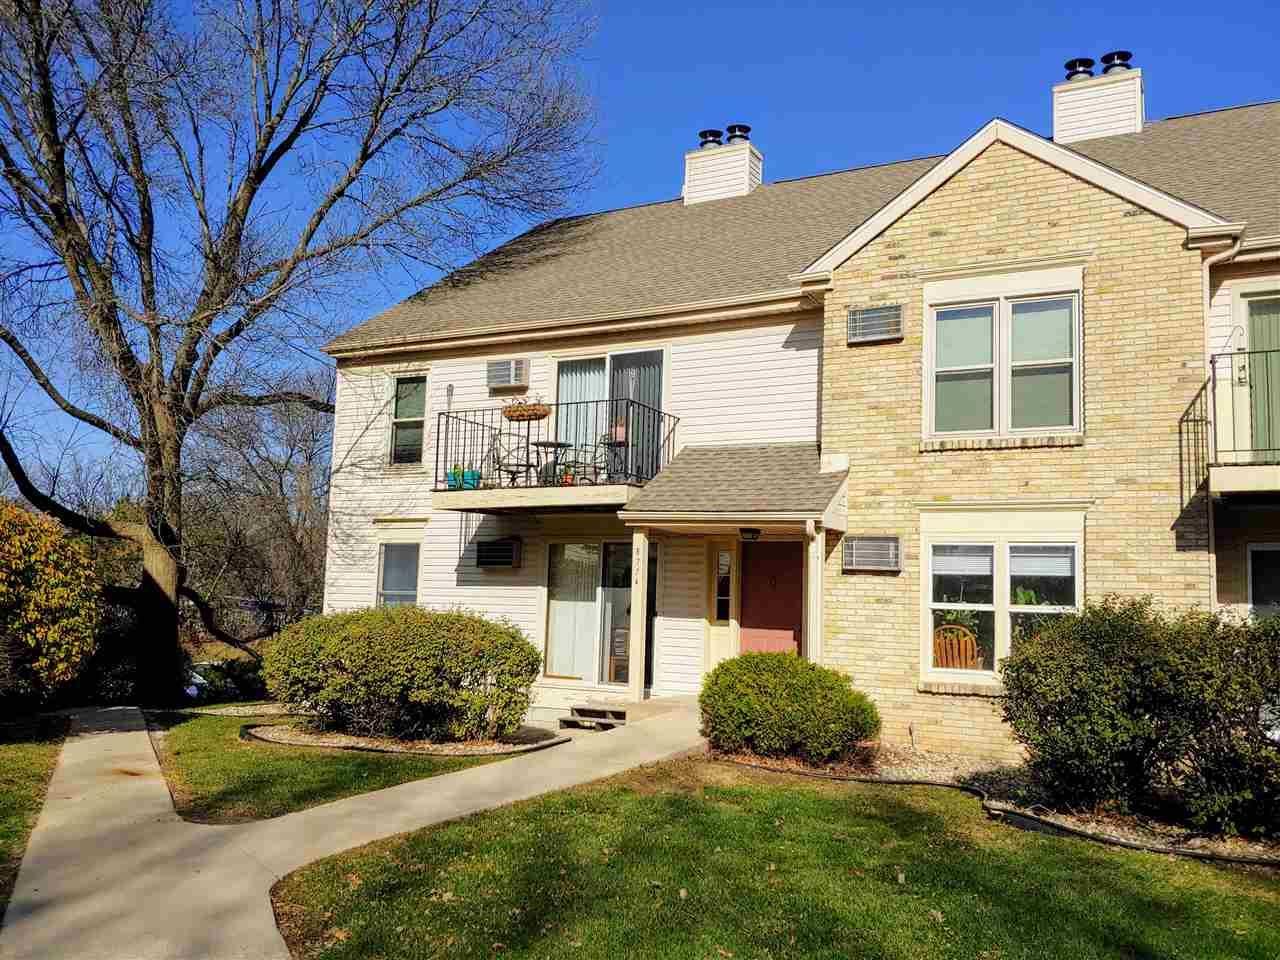 6774 Park Ridge Dr #C, Madison, WI 53719 - #: 1896832